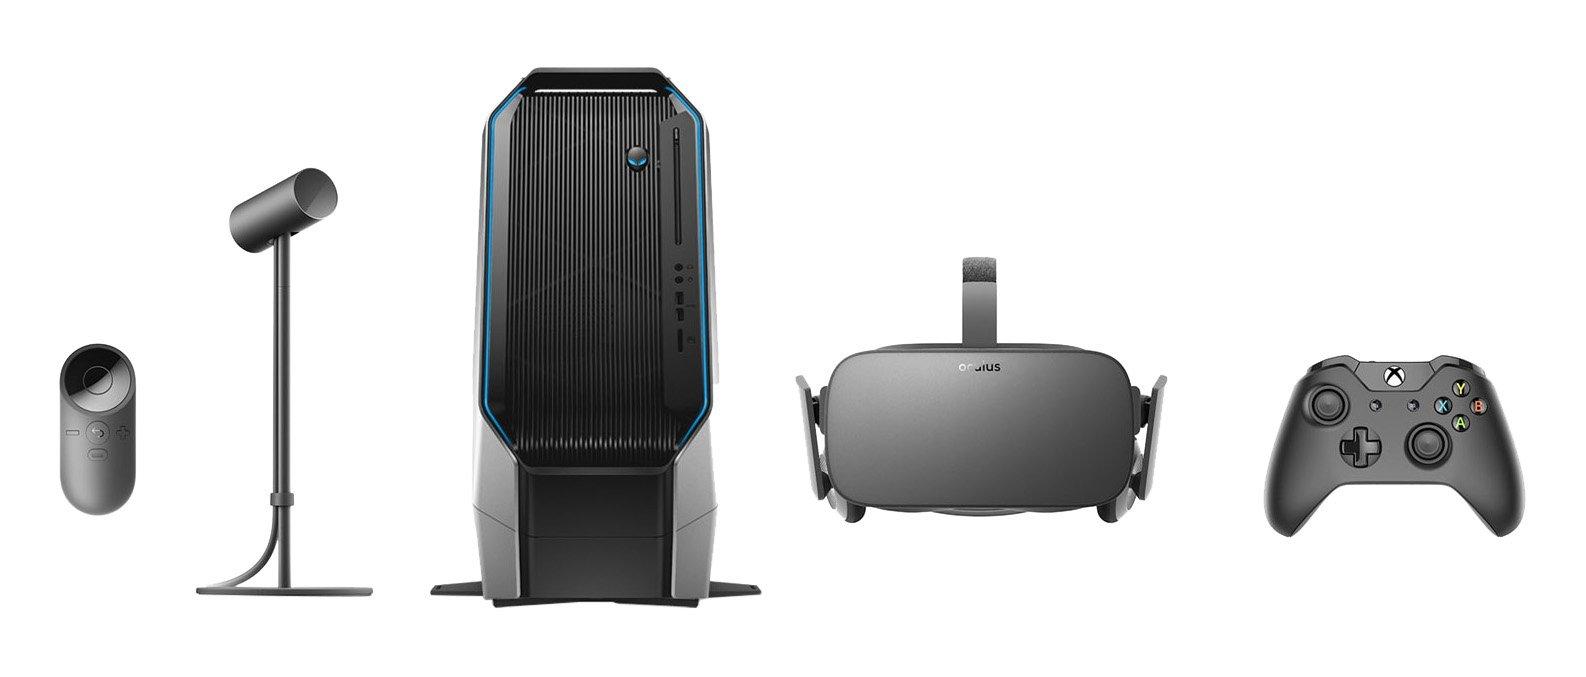 Oculus Rift + Alienware Oculus Ready Area 51 Gaming Desktop PC Bundle [Bundle is Discontinued]